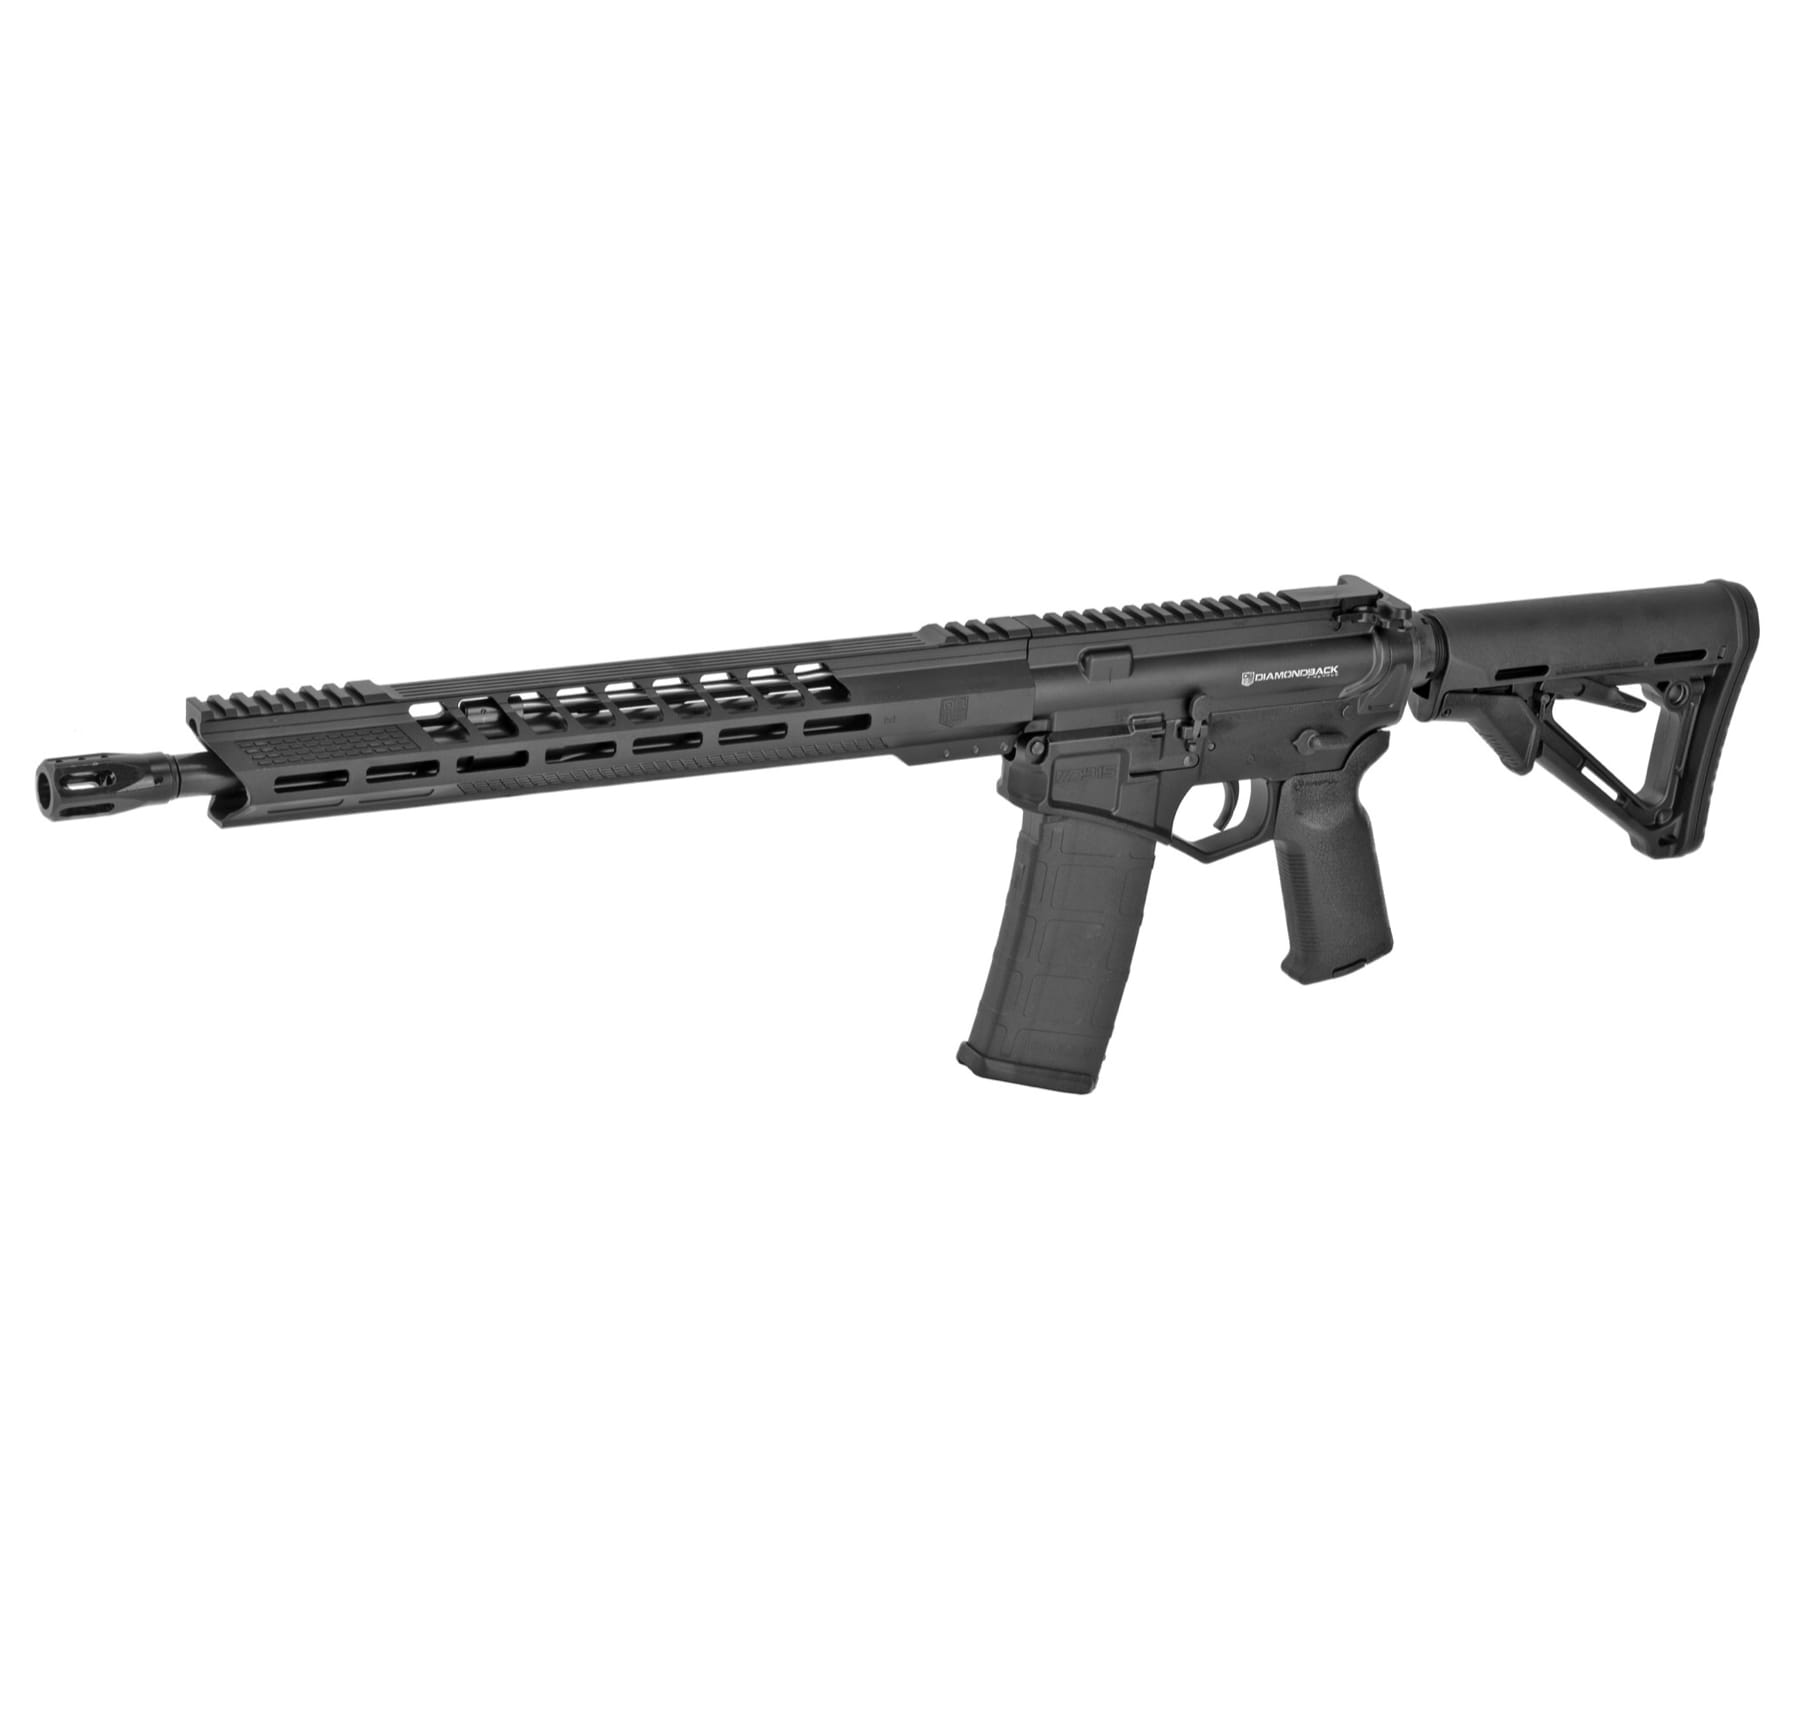 DIAMONDBACK DB15 Tactical V-Rail AR-15